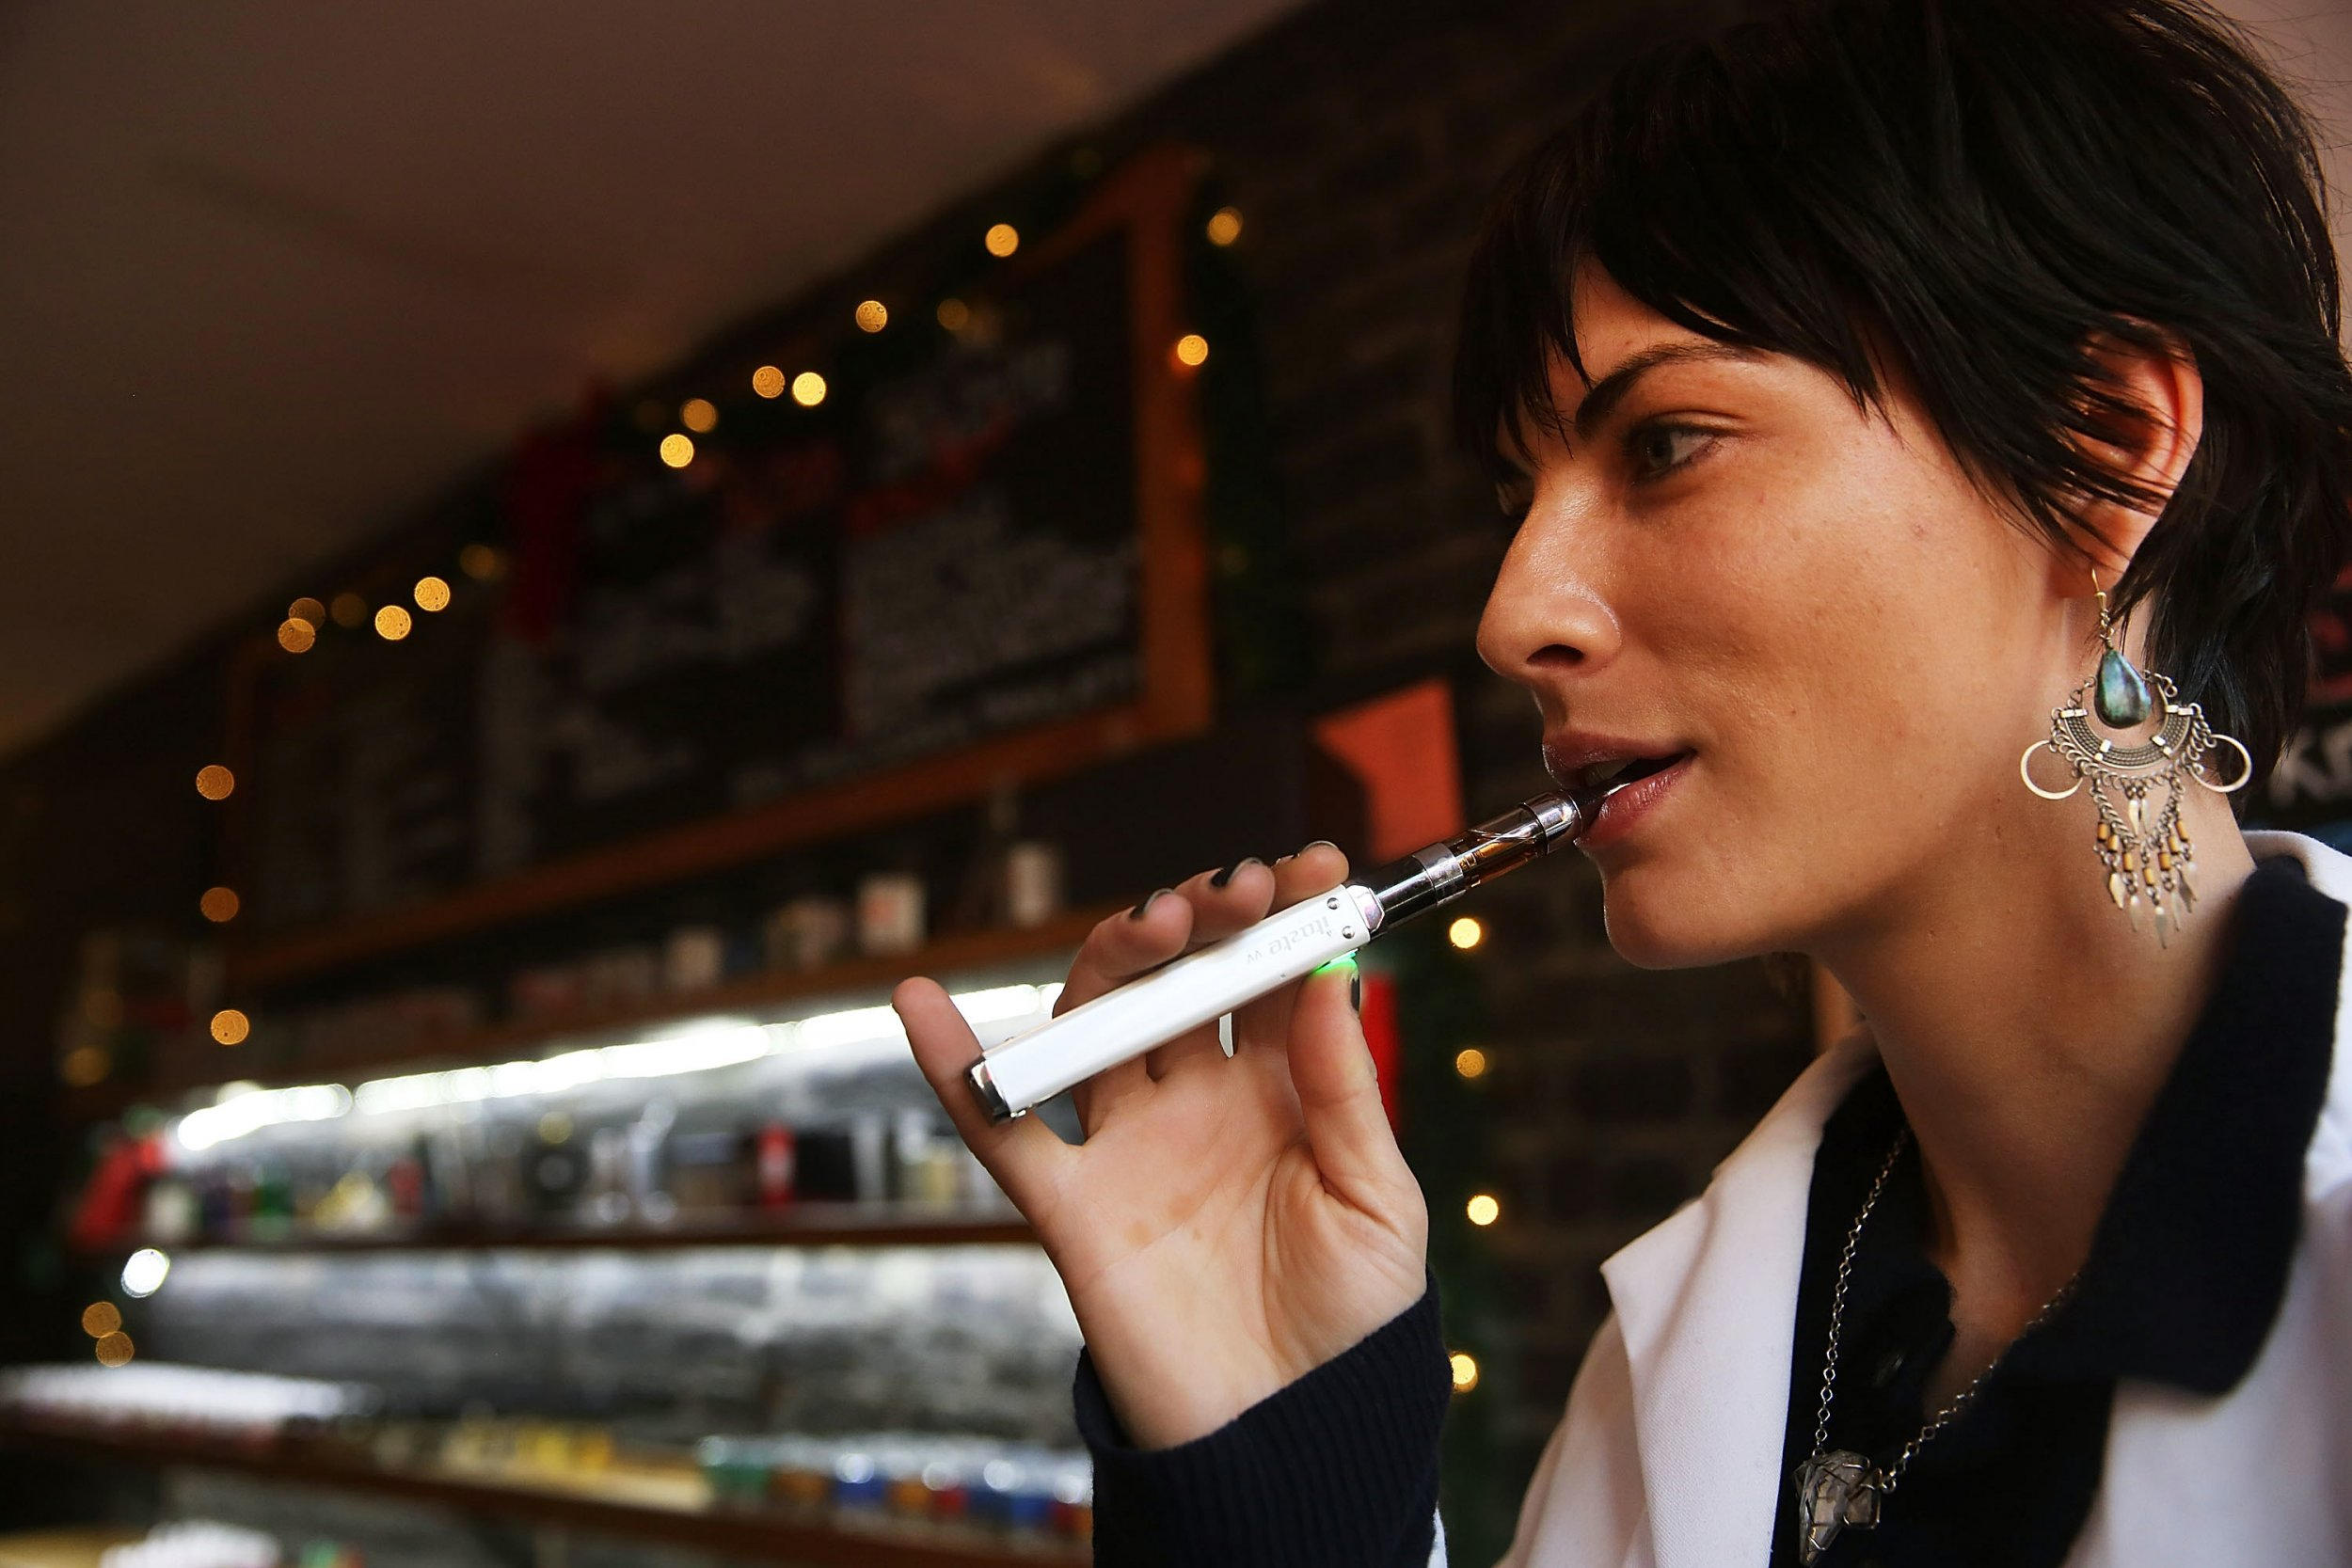 09_20_woman smoking e-cigarette_01